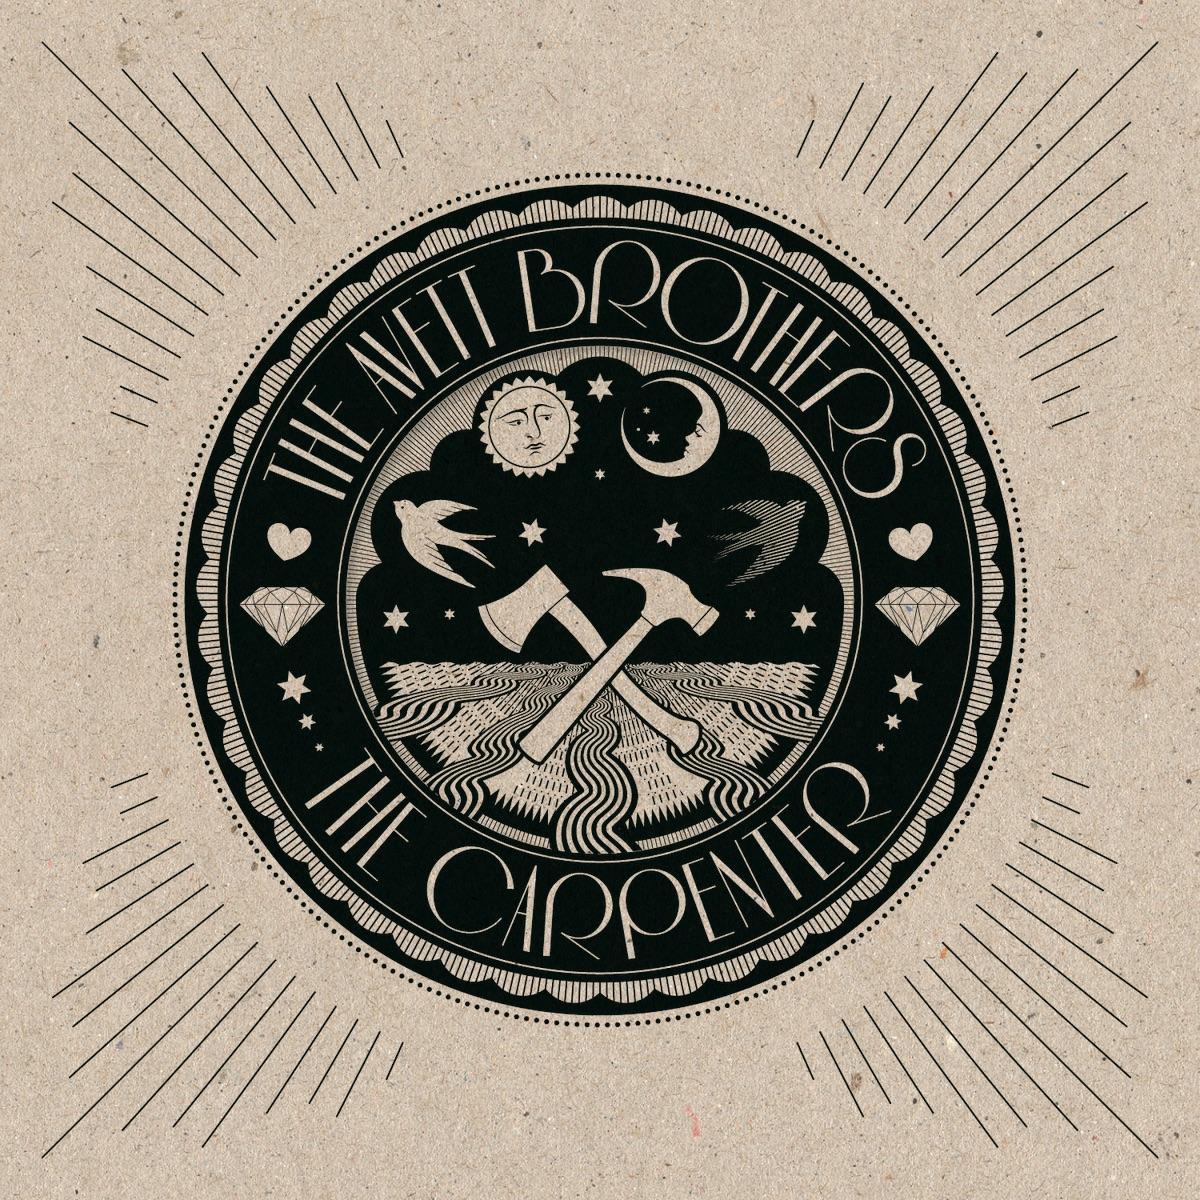 The Carpenter The Avett Brothers CD cover